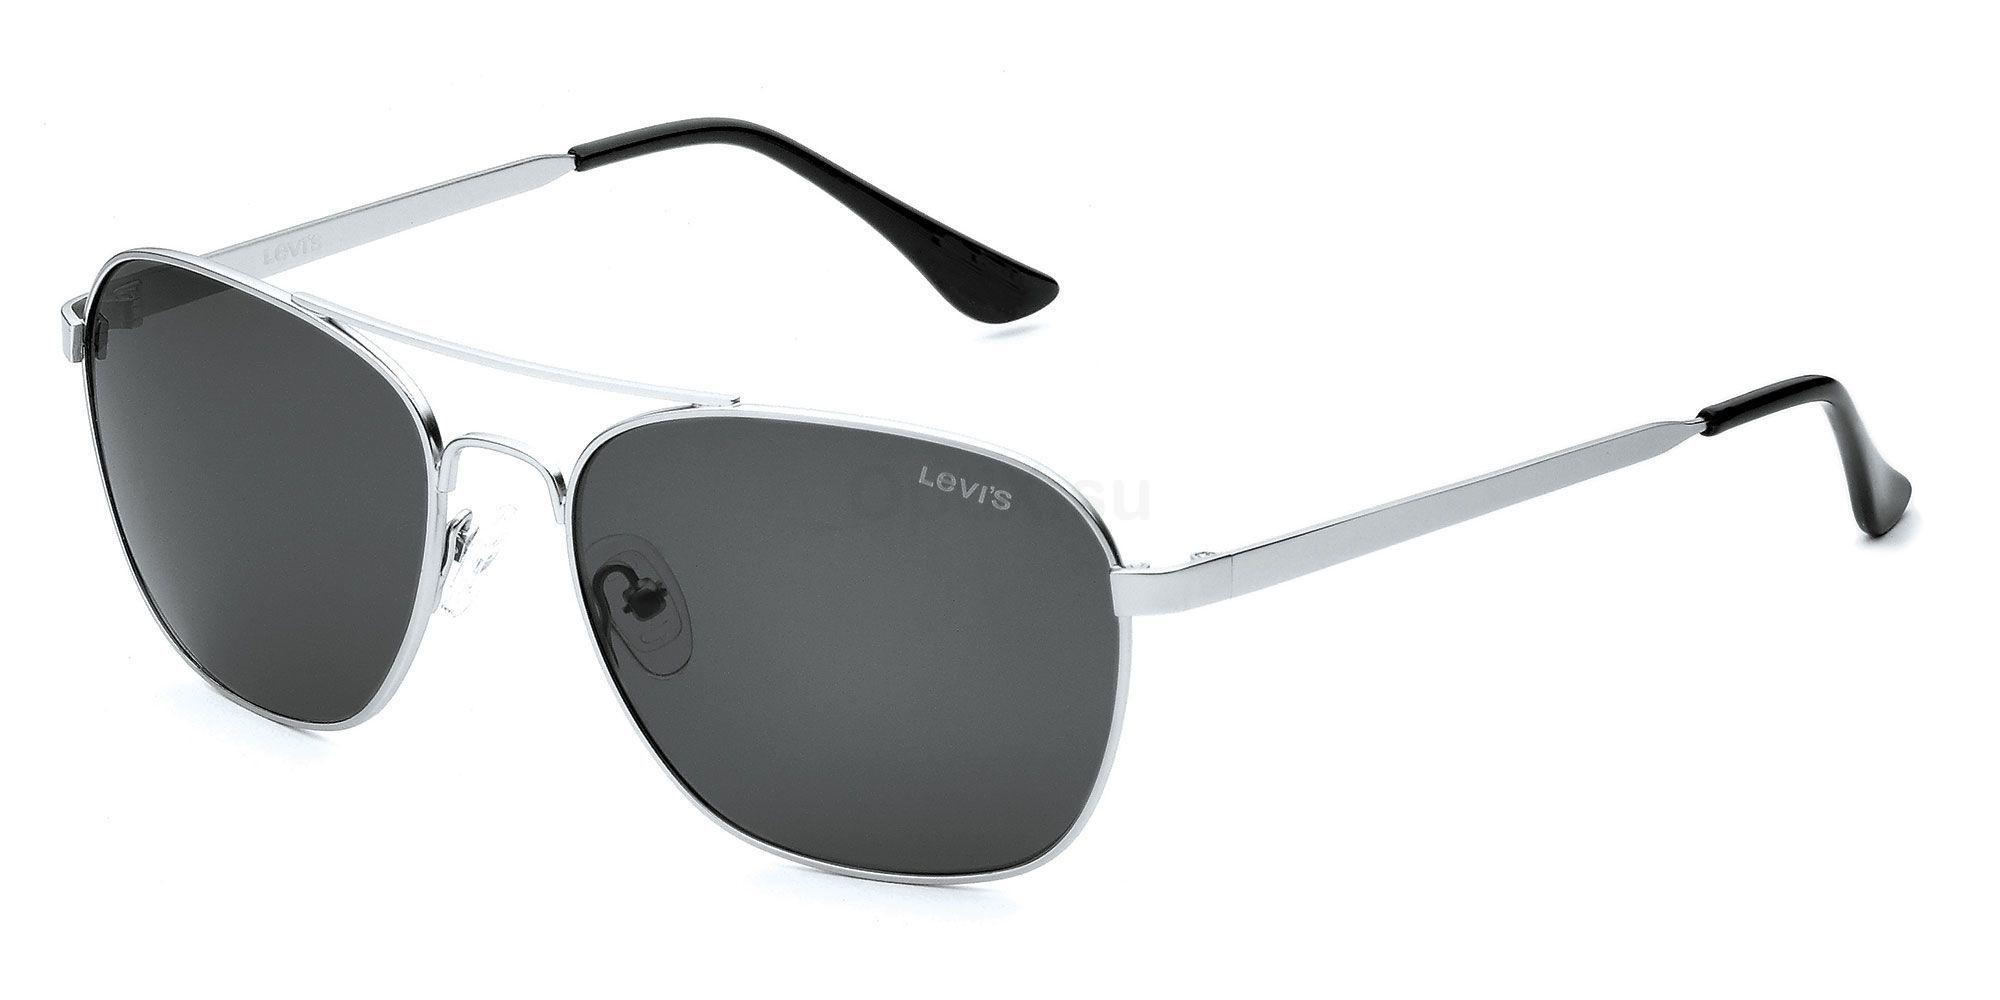 LO22369/01 LO22369 , Levi's Eyewear